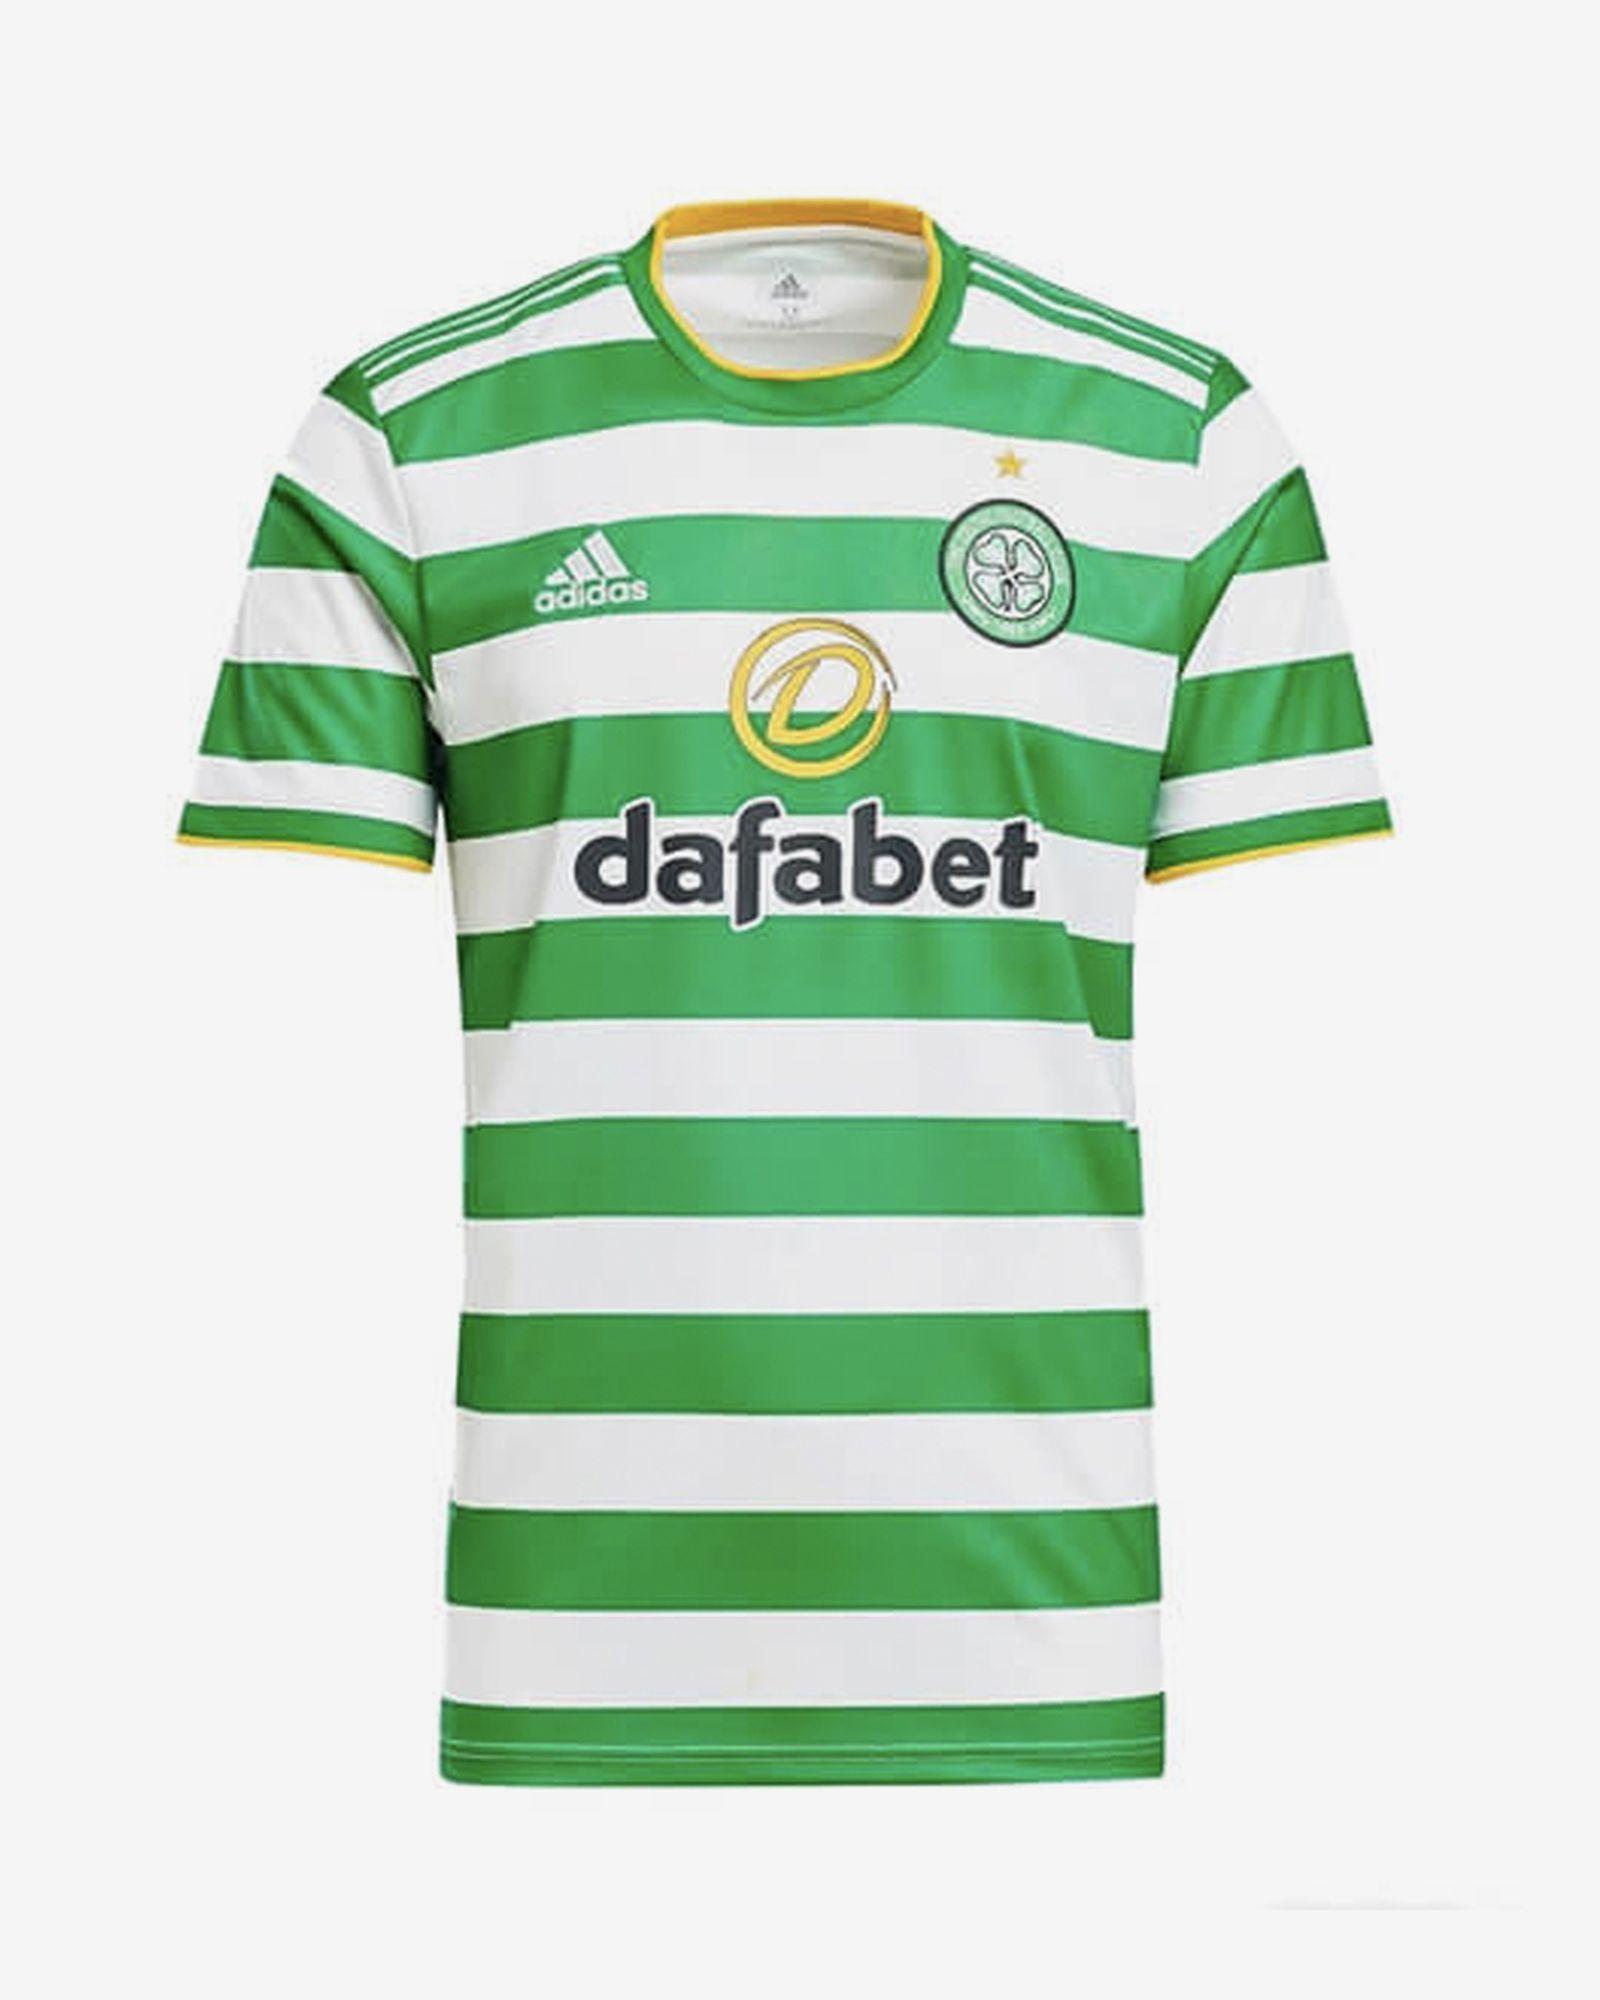 football-shirts-2020-review-17